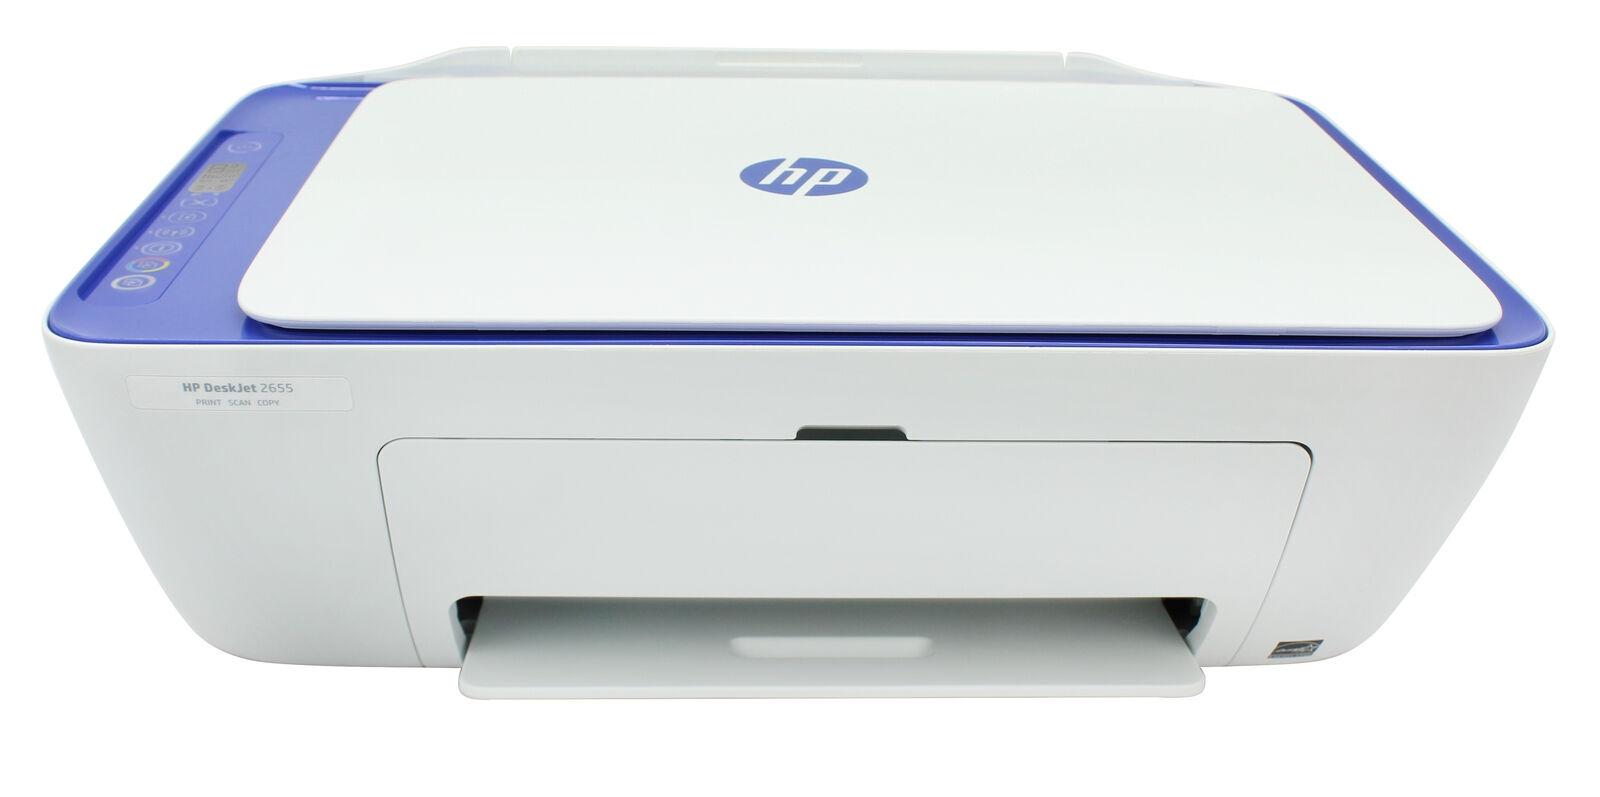 Cartuchos HP Deskjet 2655